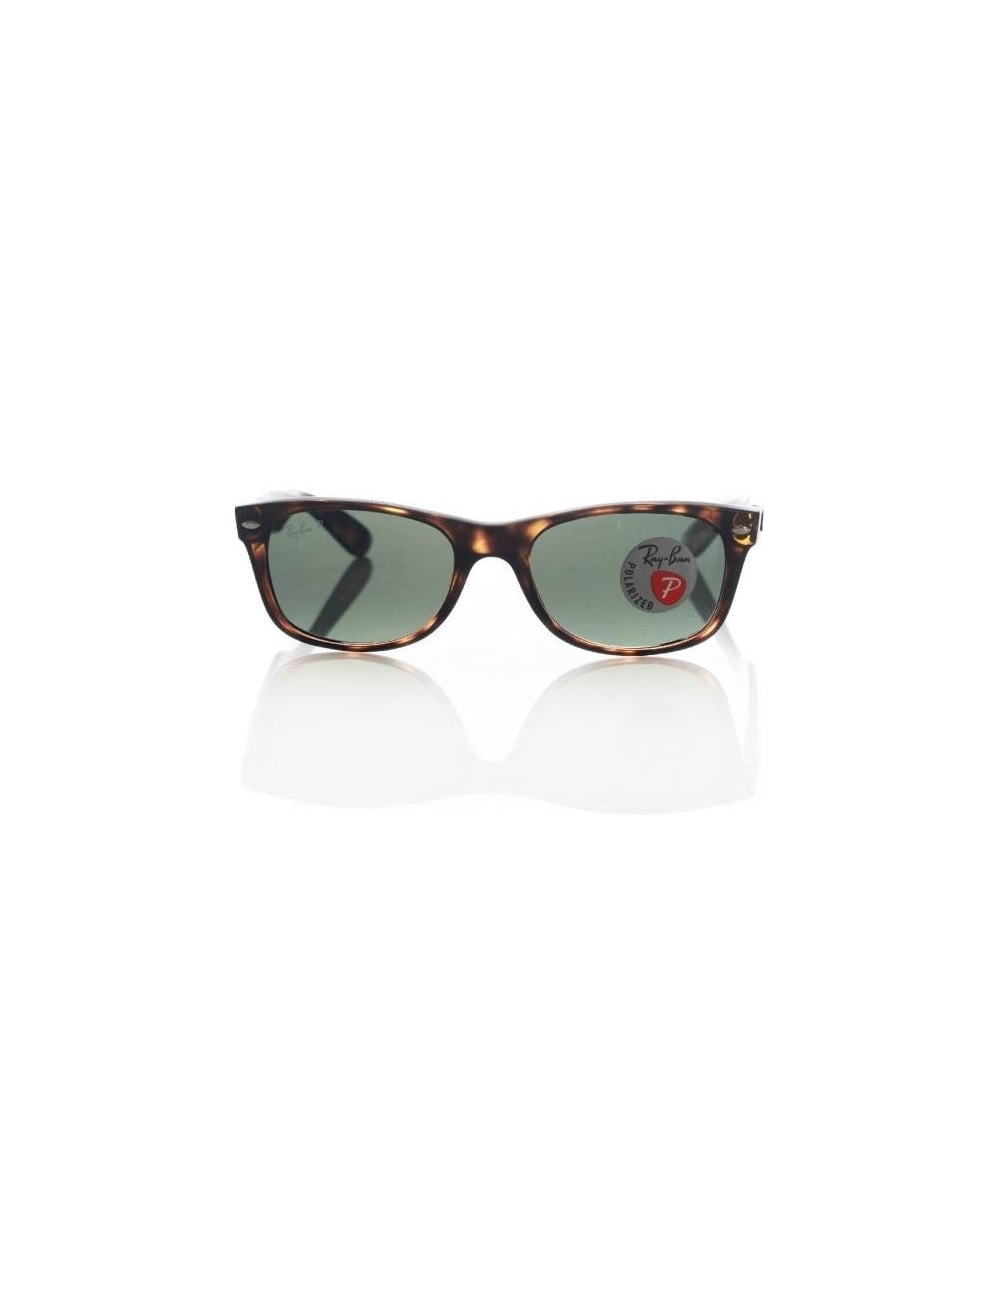 e46a9000fd Ray-Ban New Wayfarer Sunglasses - Tortoise